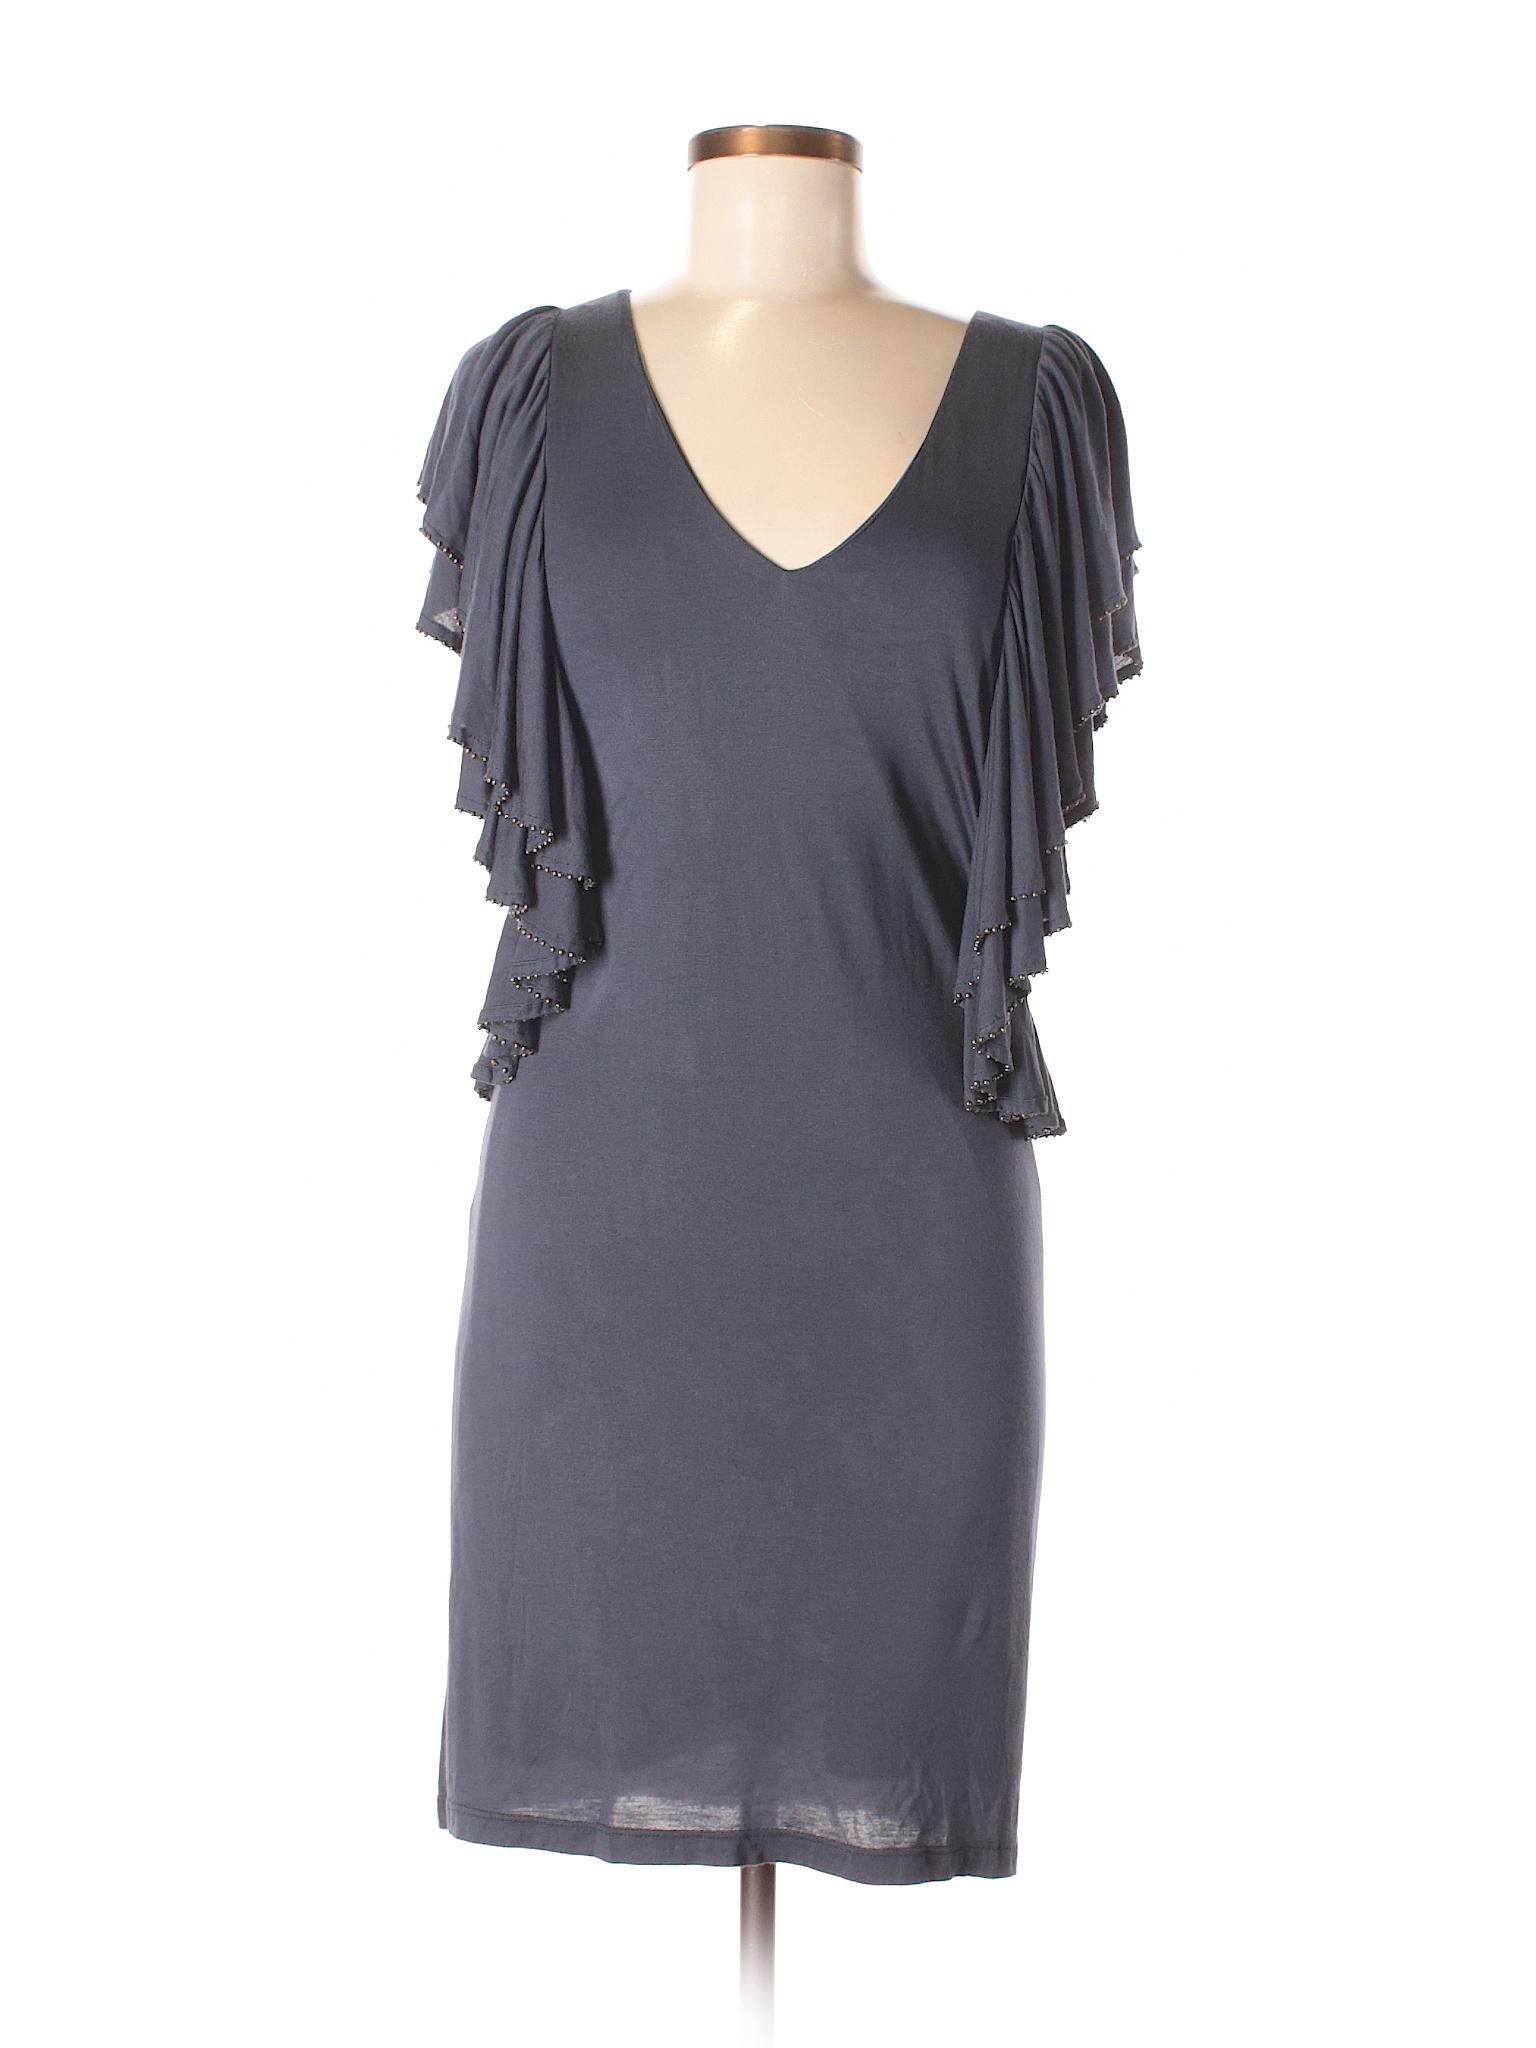 Casual Isabel Selling Lu Dress Selling Lu Isabel HX5Twq